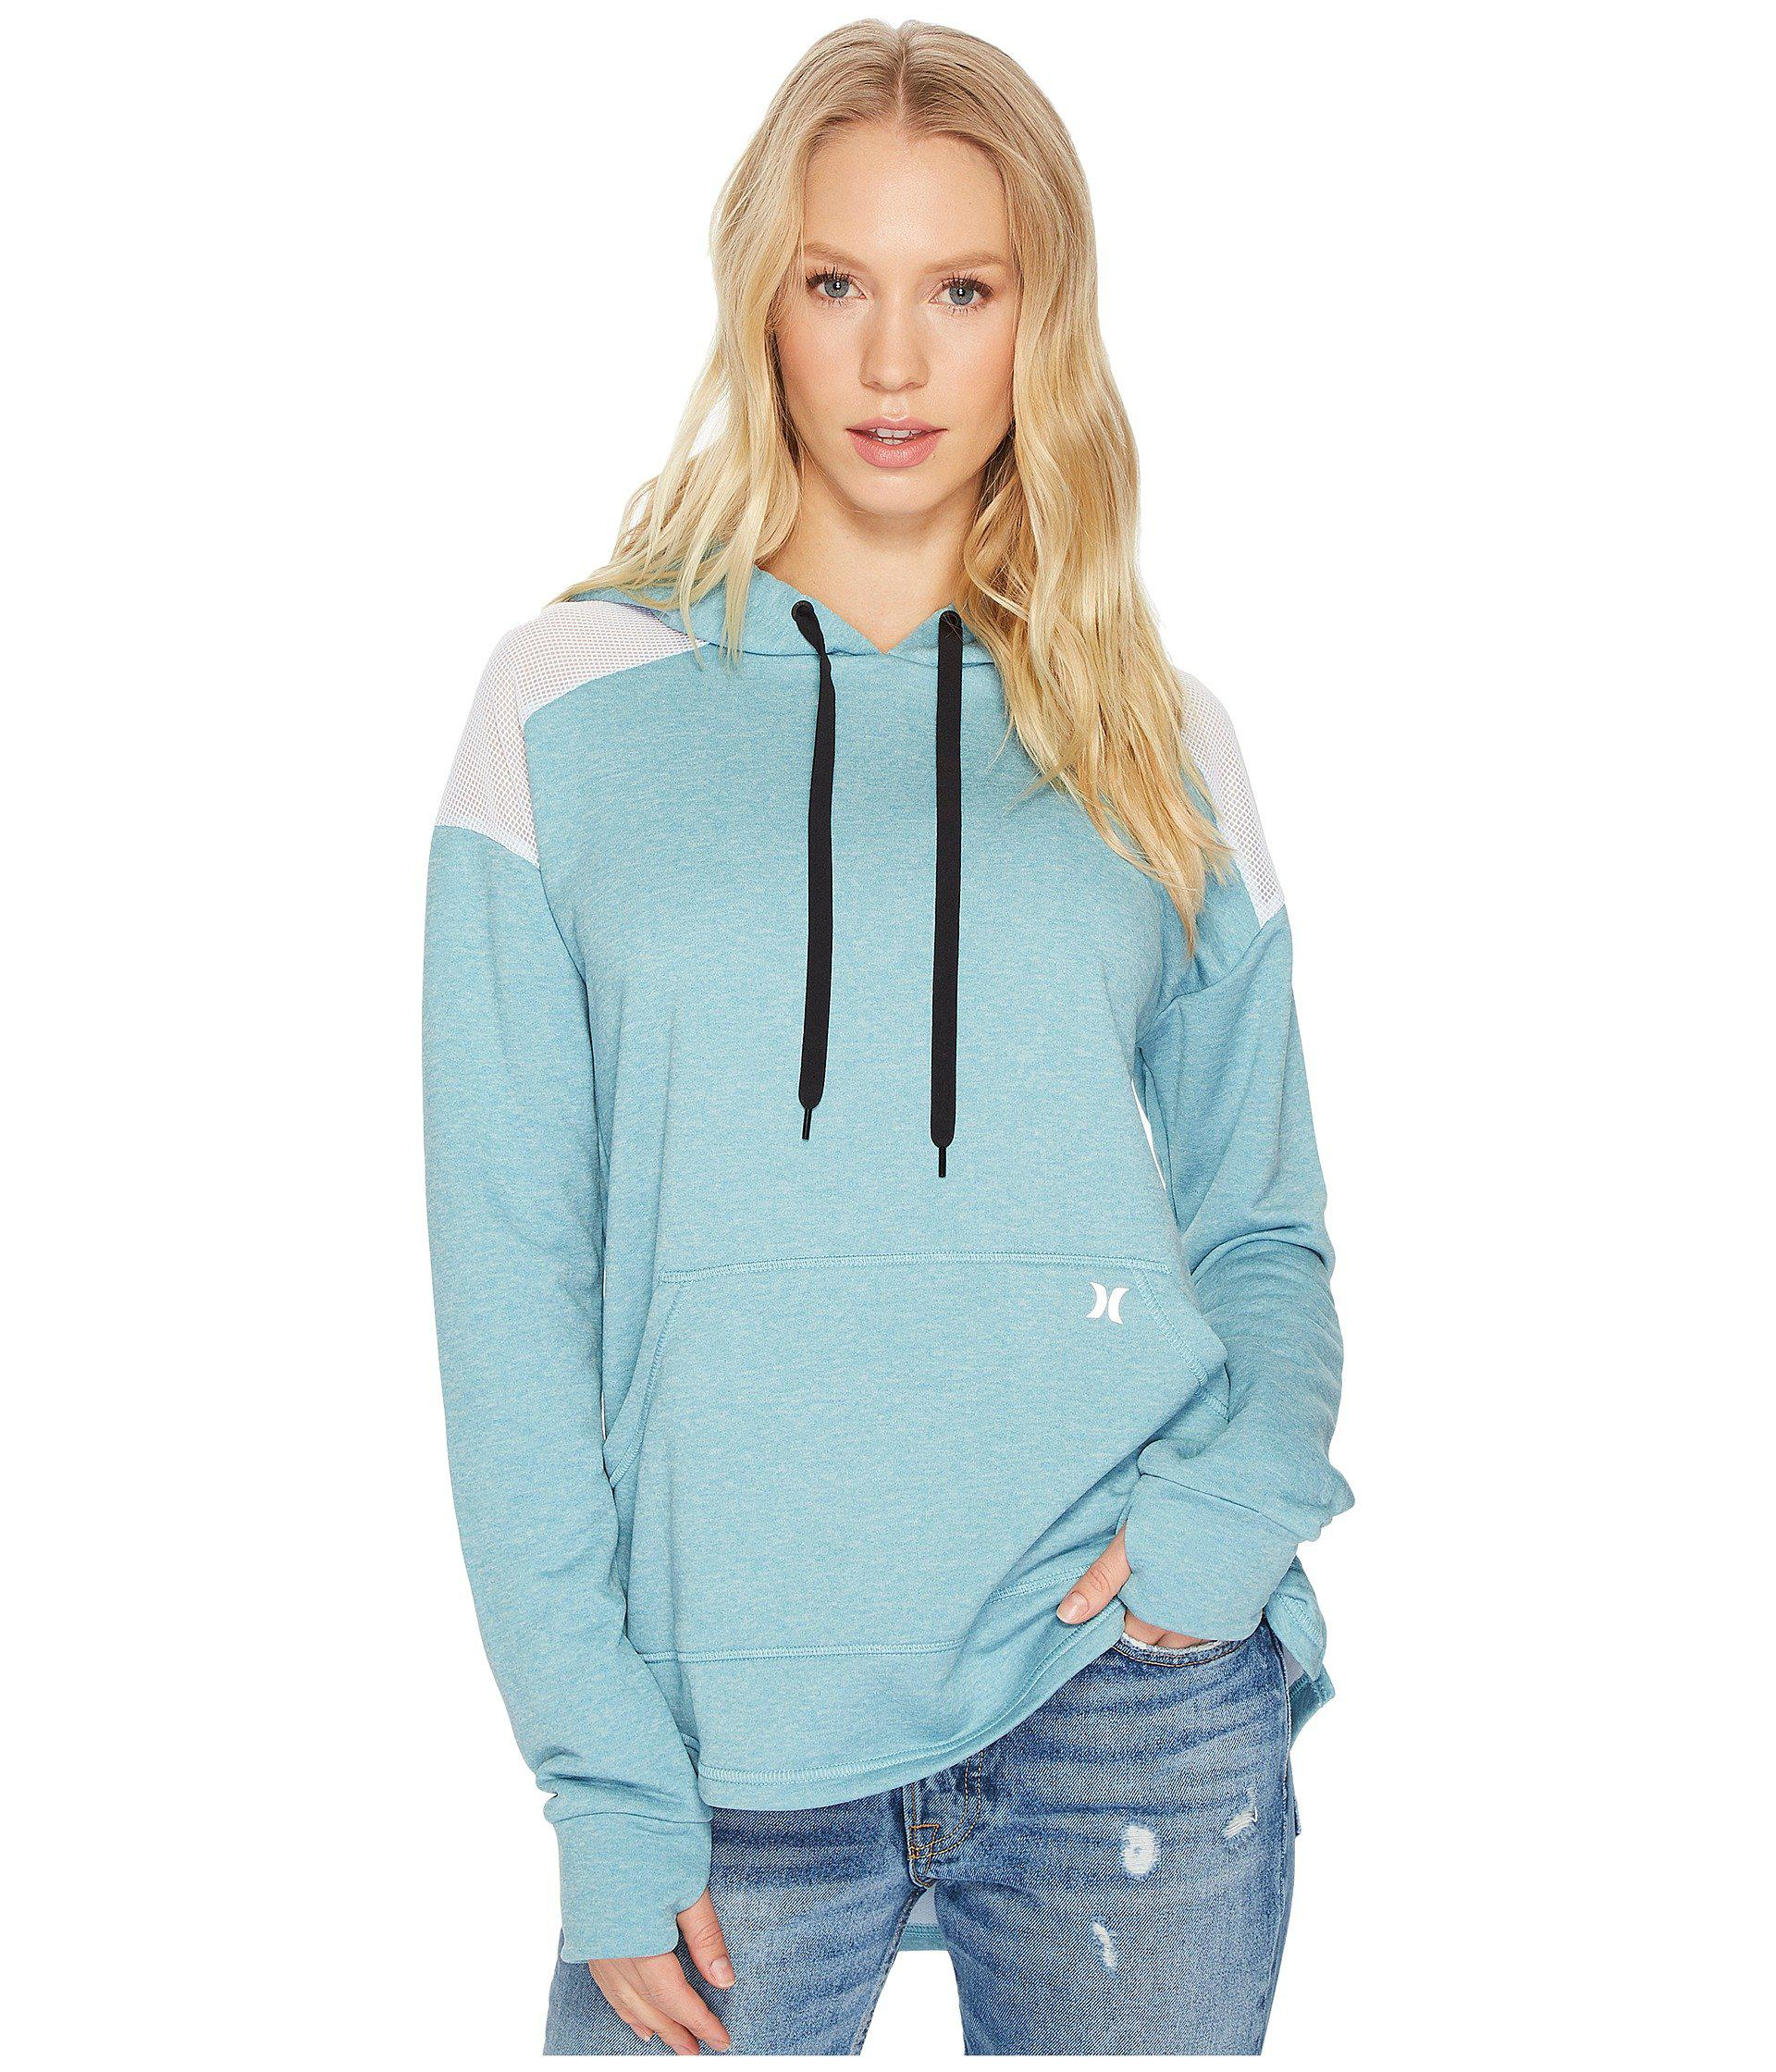 763865631766 Lyst - Hurley Dri-fit United Fleece Pull In in Blue